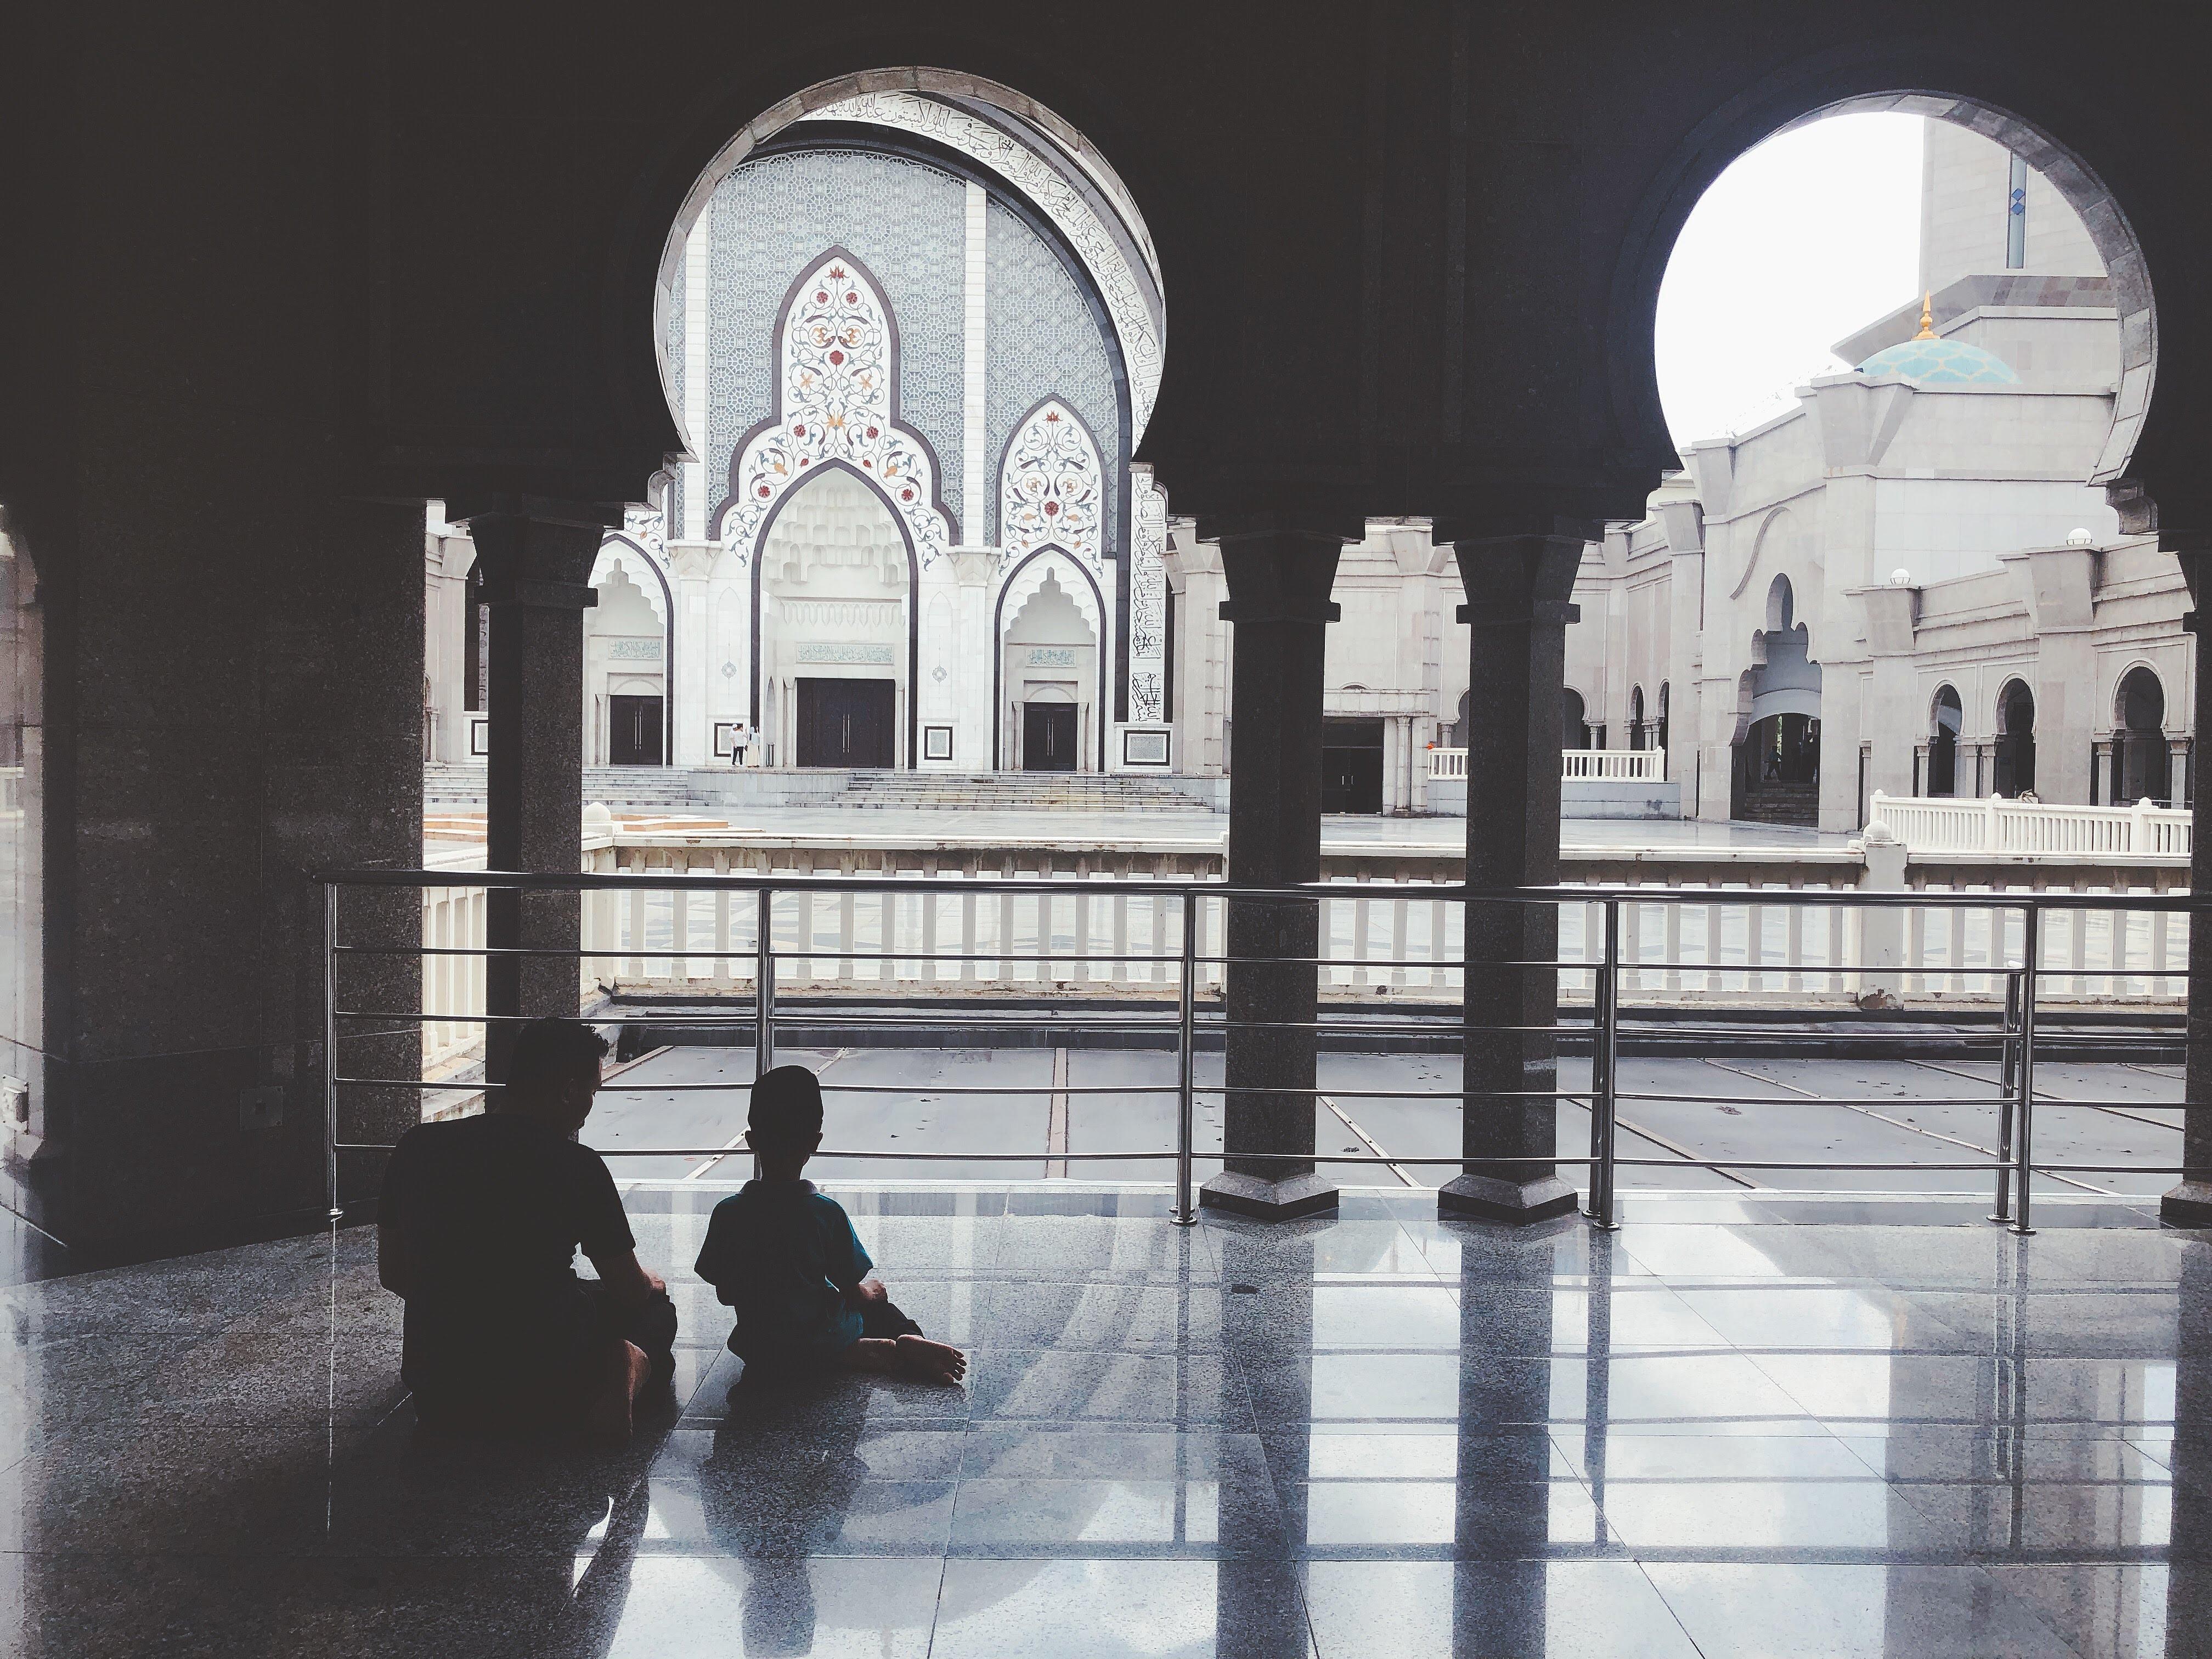 "Malaysia_MasjidWilayahPersekutuan_013"""""